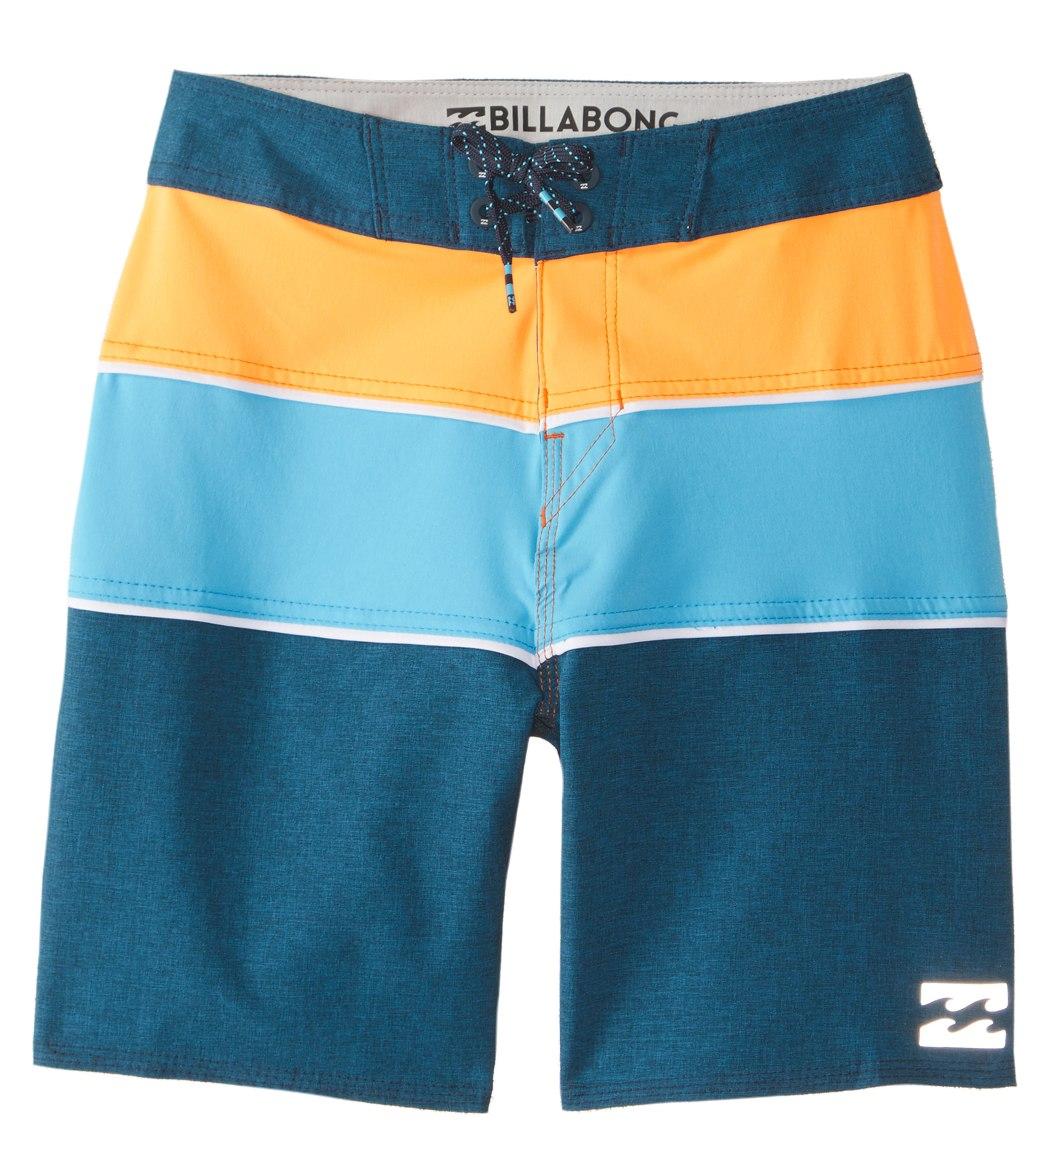 a4a41261cd Billabong Boys' Tribong X Boardshort (8-20) at SwimOutlet.com - Free  Shipping